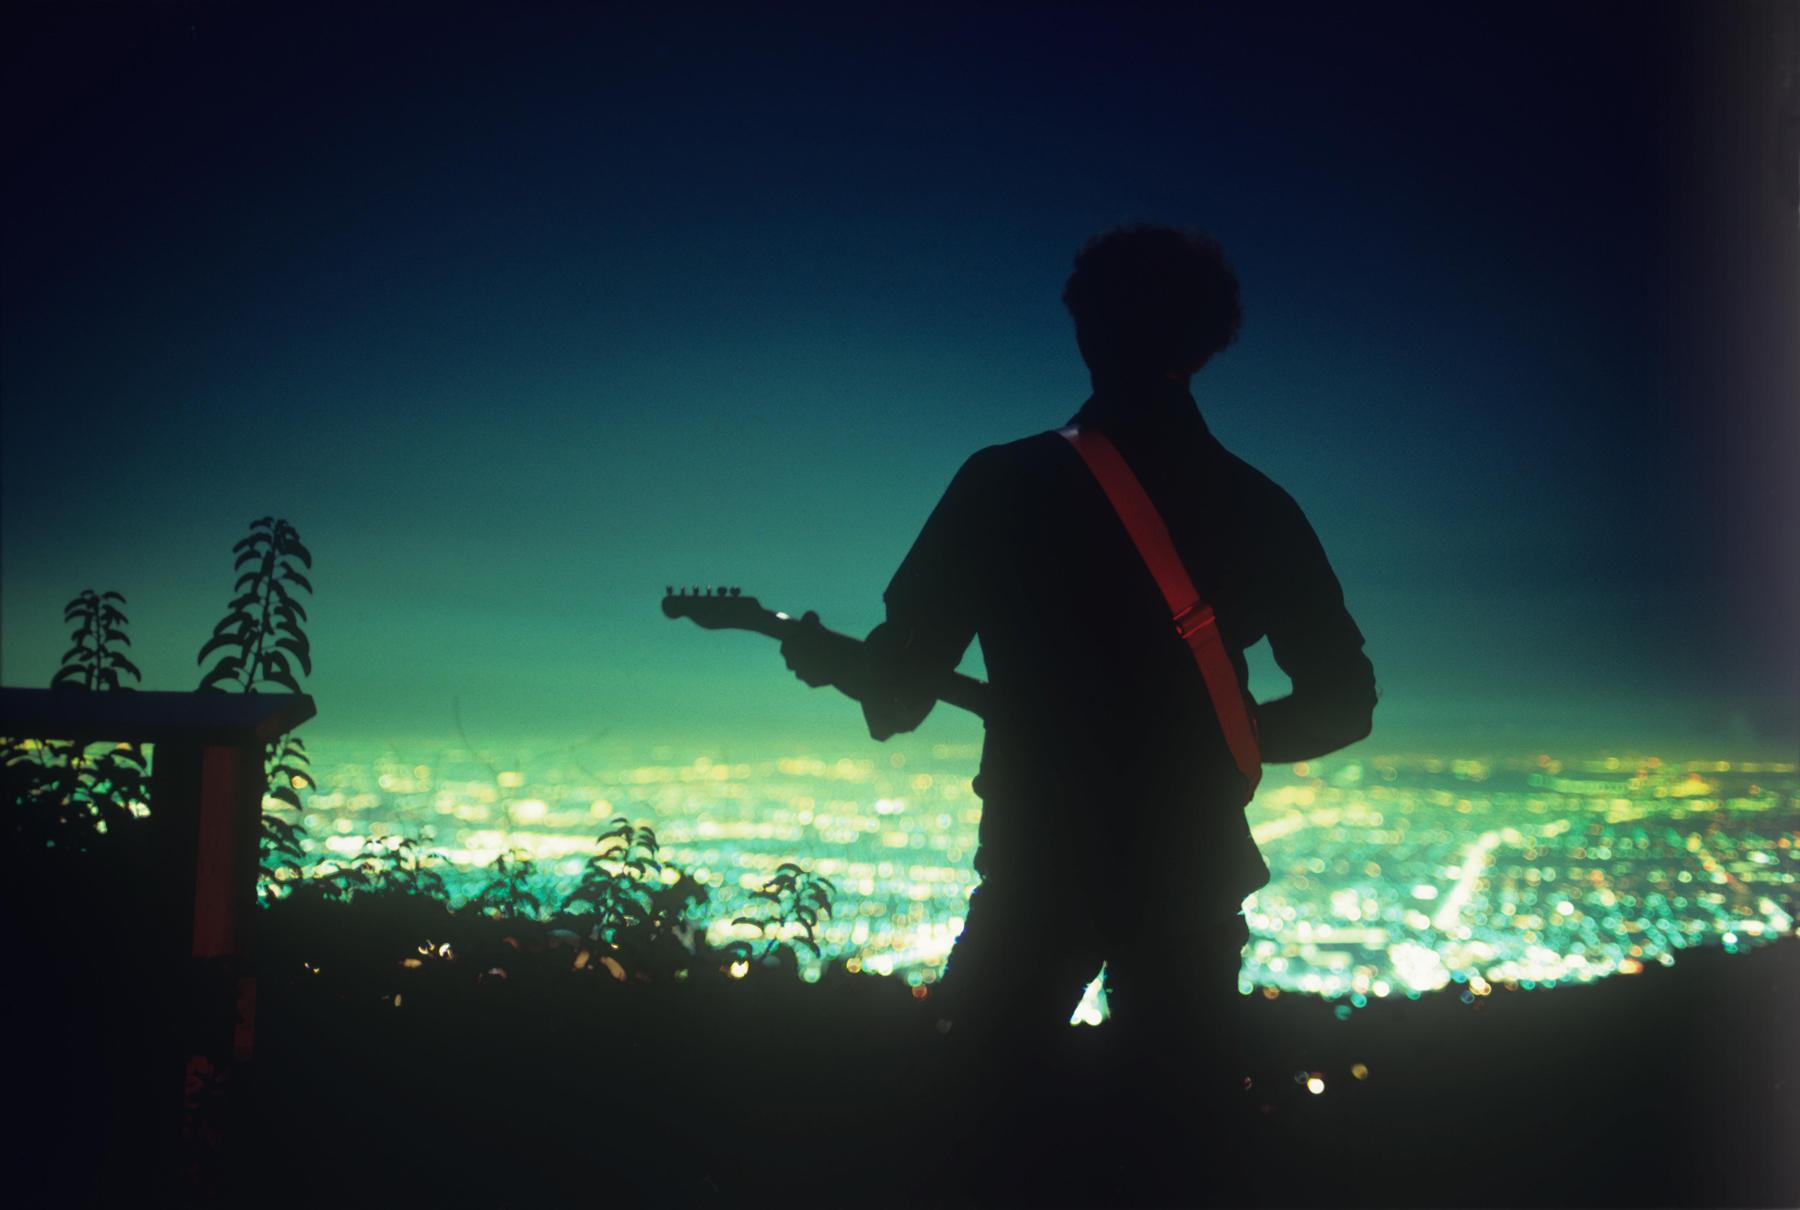 Bernie Leadon on 'Laurel Canyon' Doc, Gram Parsons, Future With the Eagles